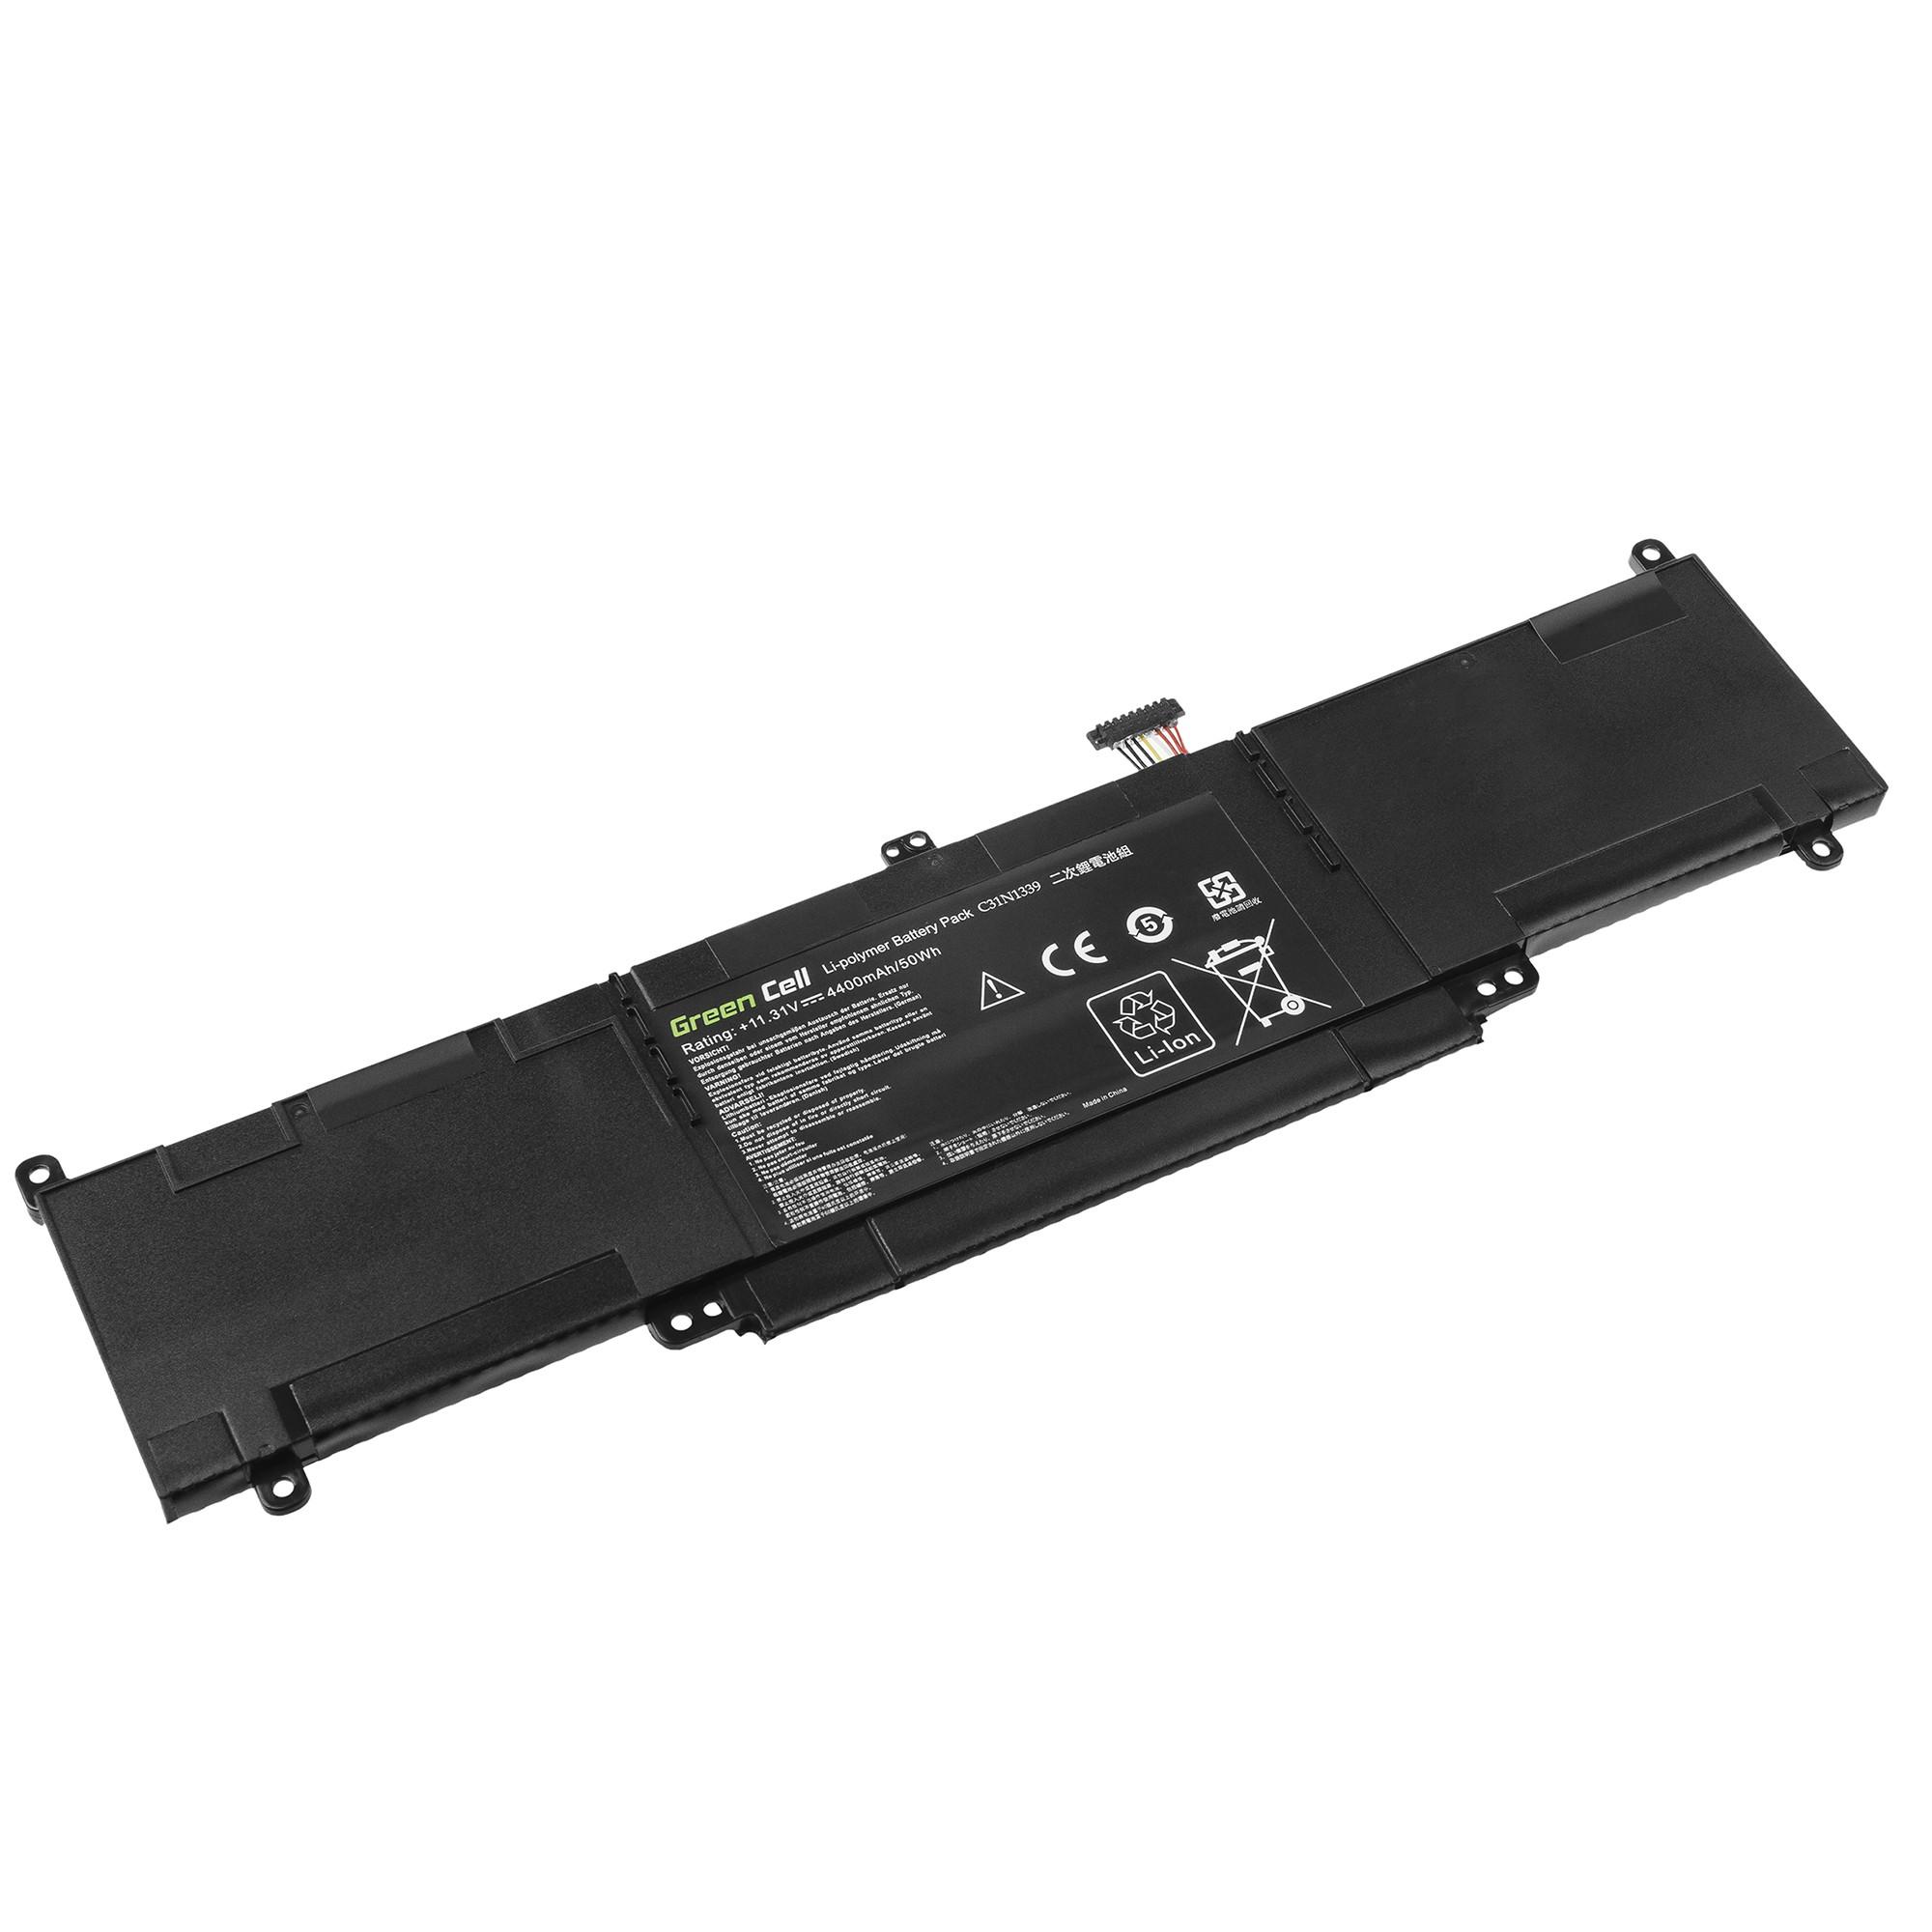 Green Cell C31N1339 Battery for Asus ZenBook UX303 UX303U UX303UA UX303UB UX303L aksesuārs portatīvajiem datoriem